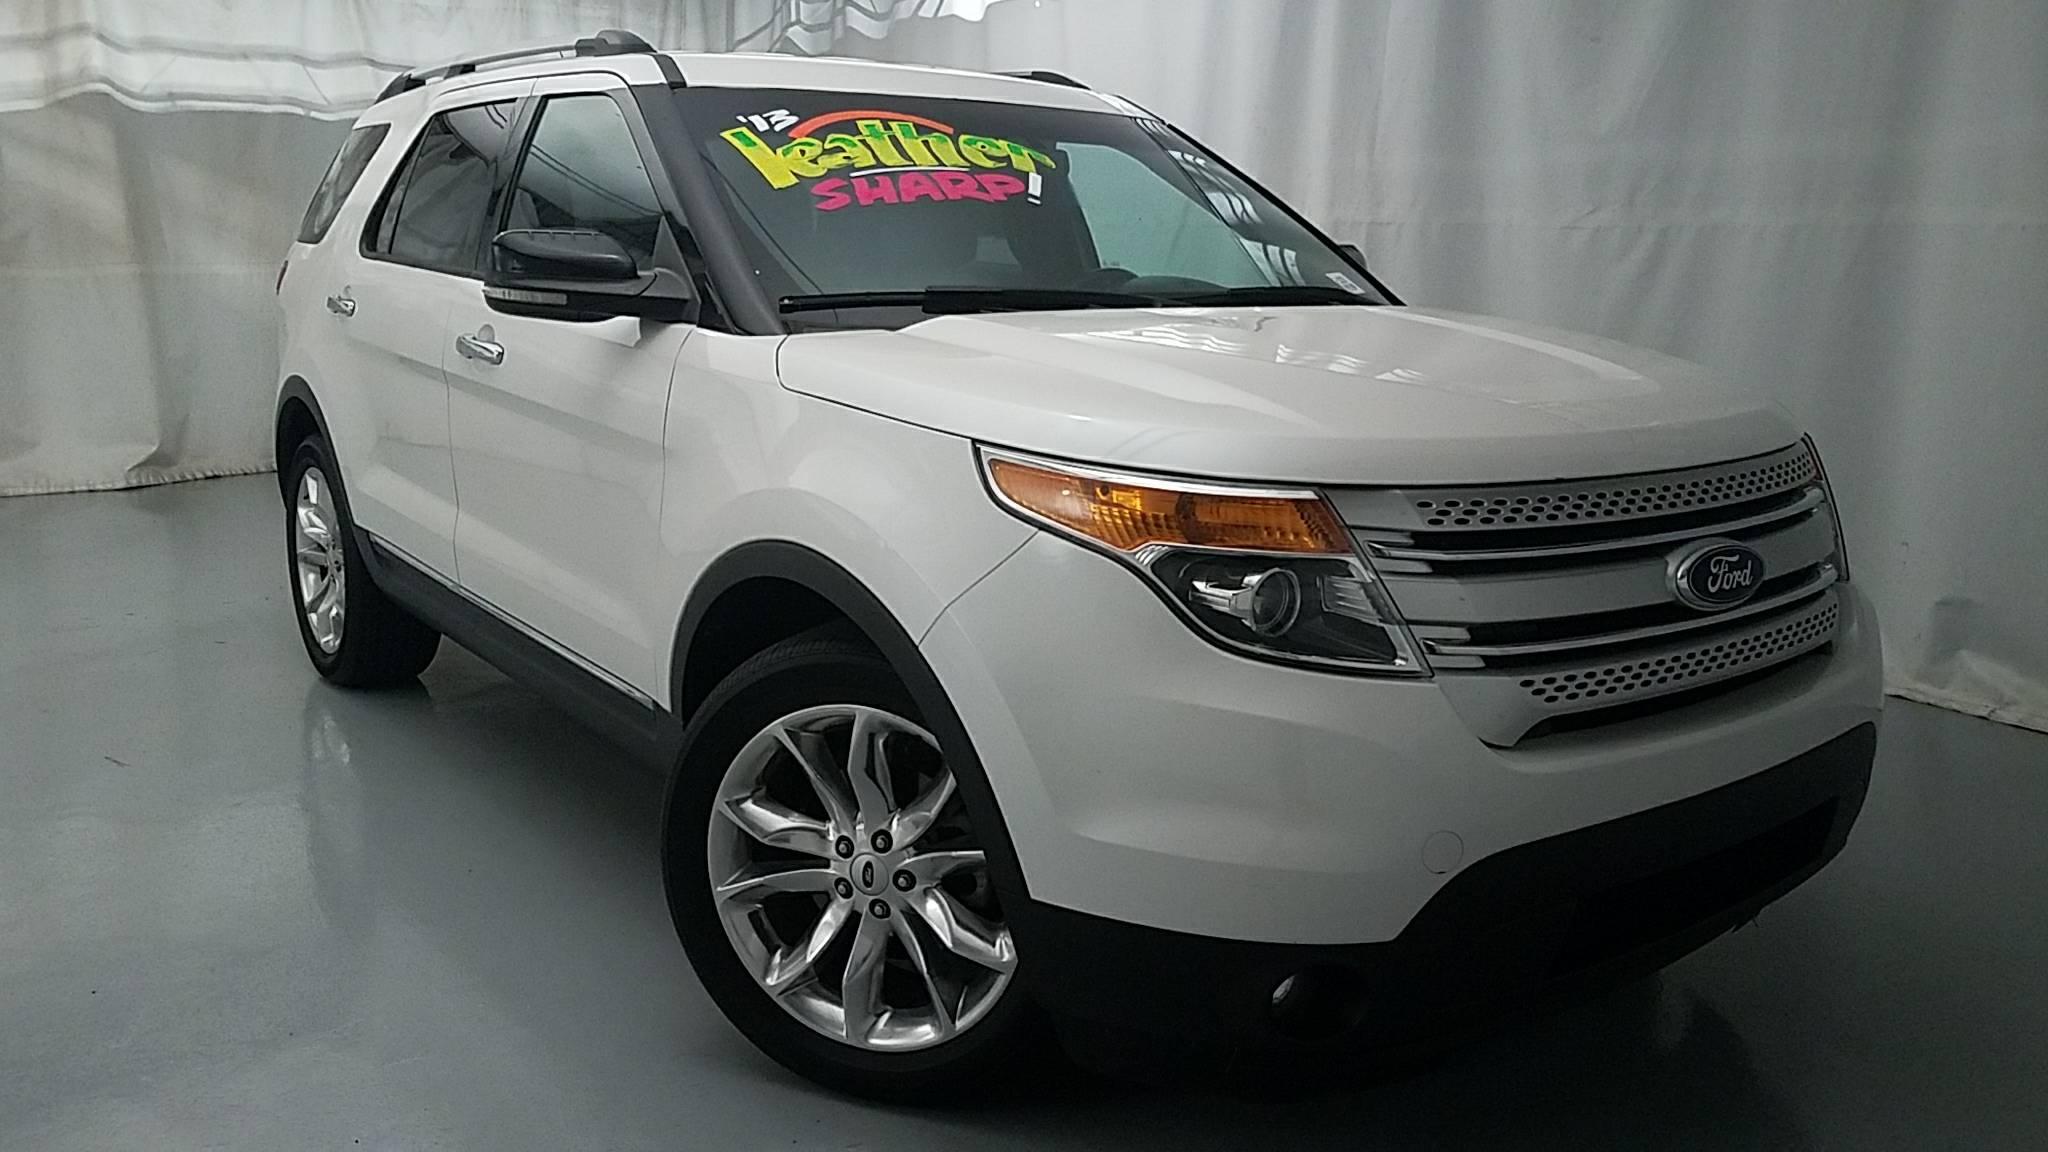 Explorer Vehicles for Sale near Hammond New Orleans & Baton Rouge